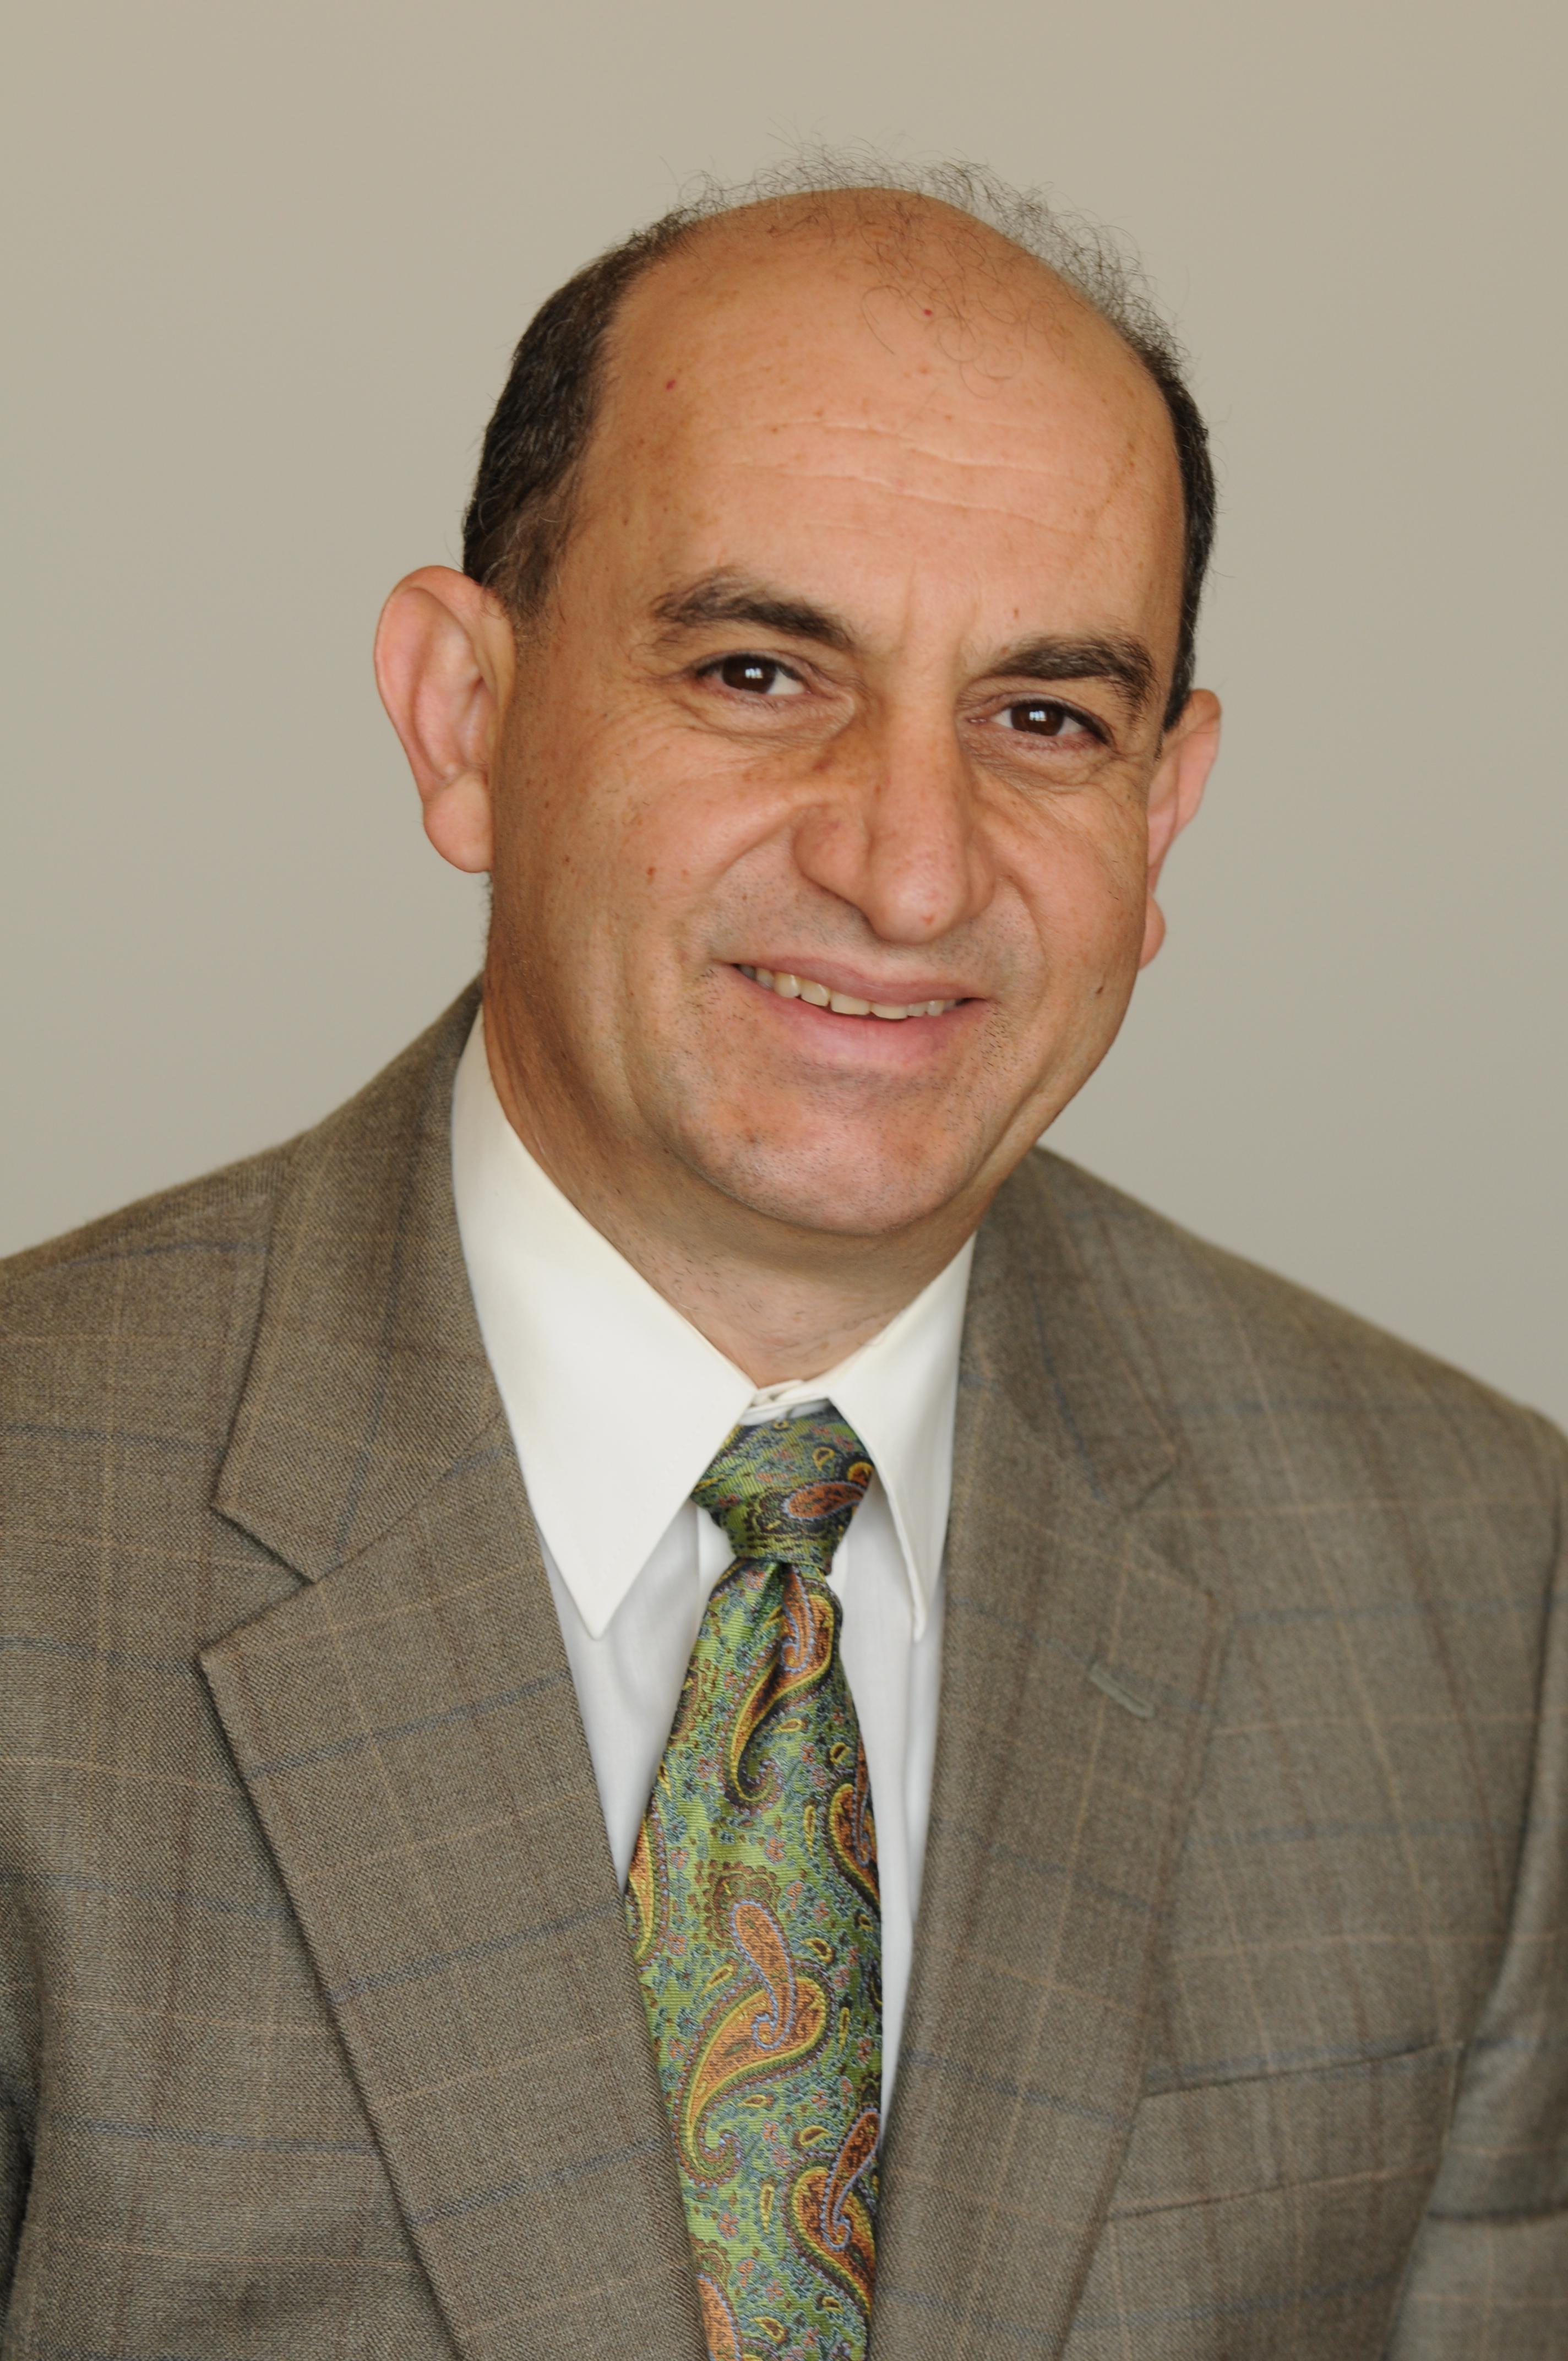 George J. Mamo, MD